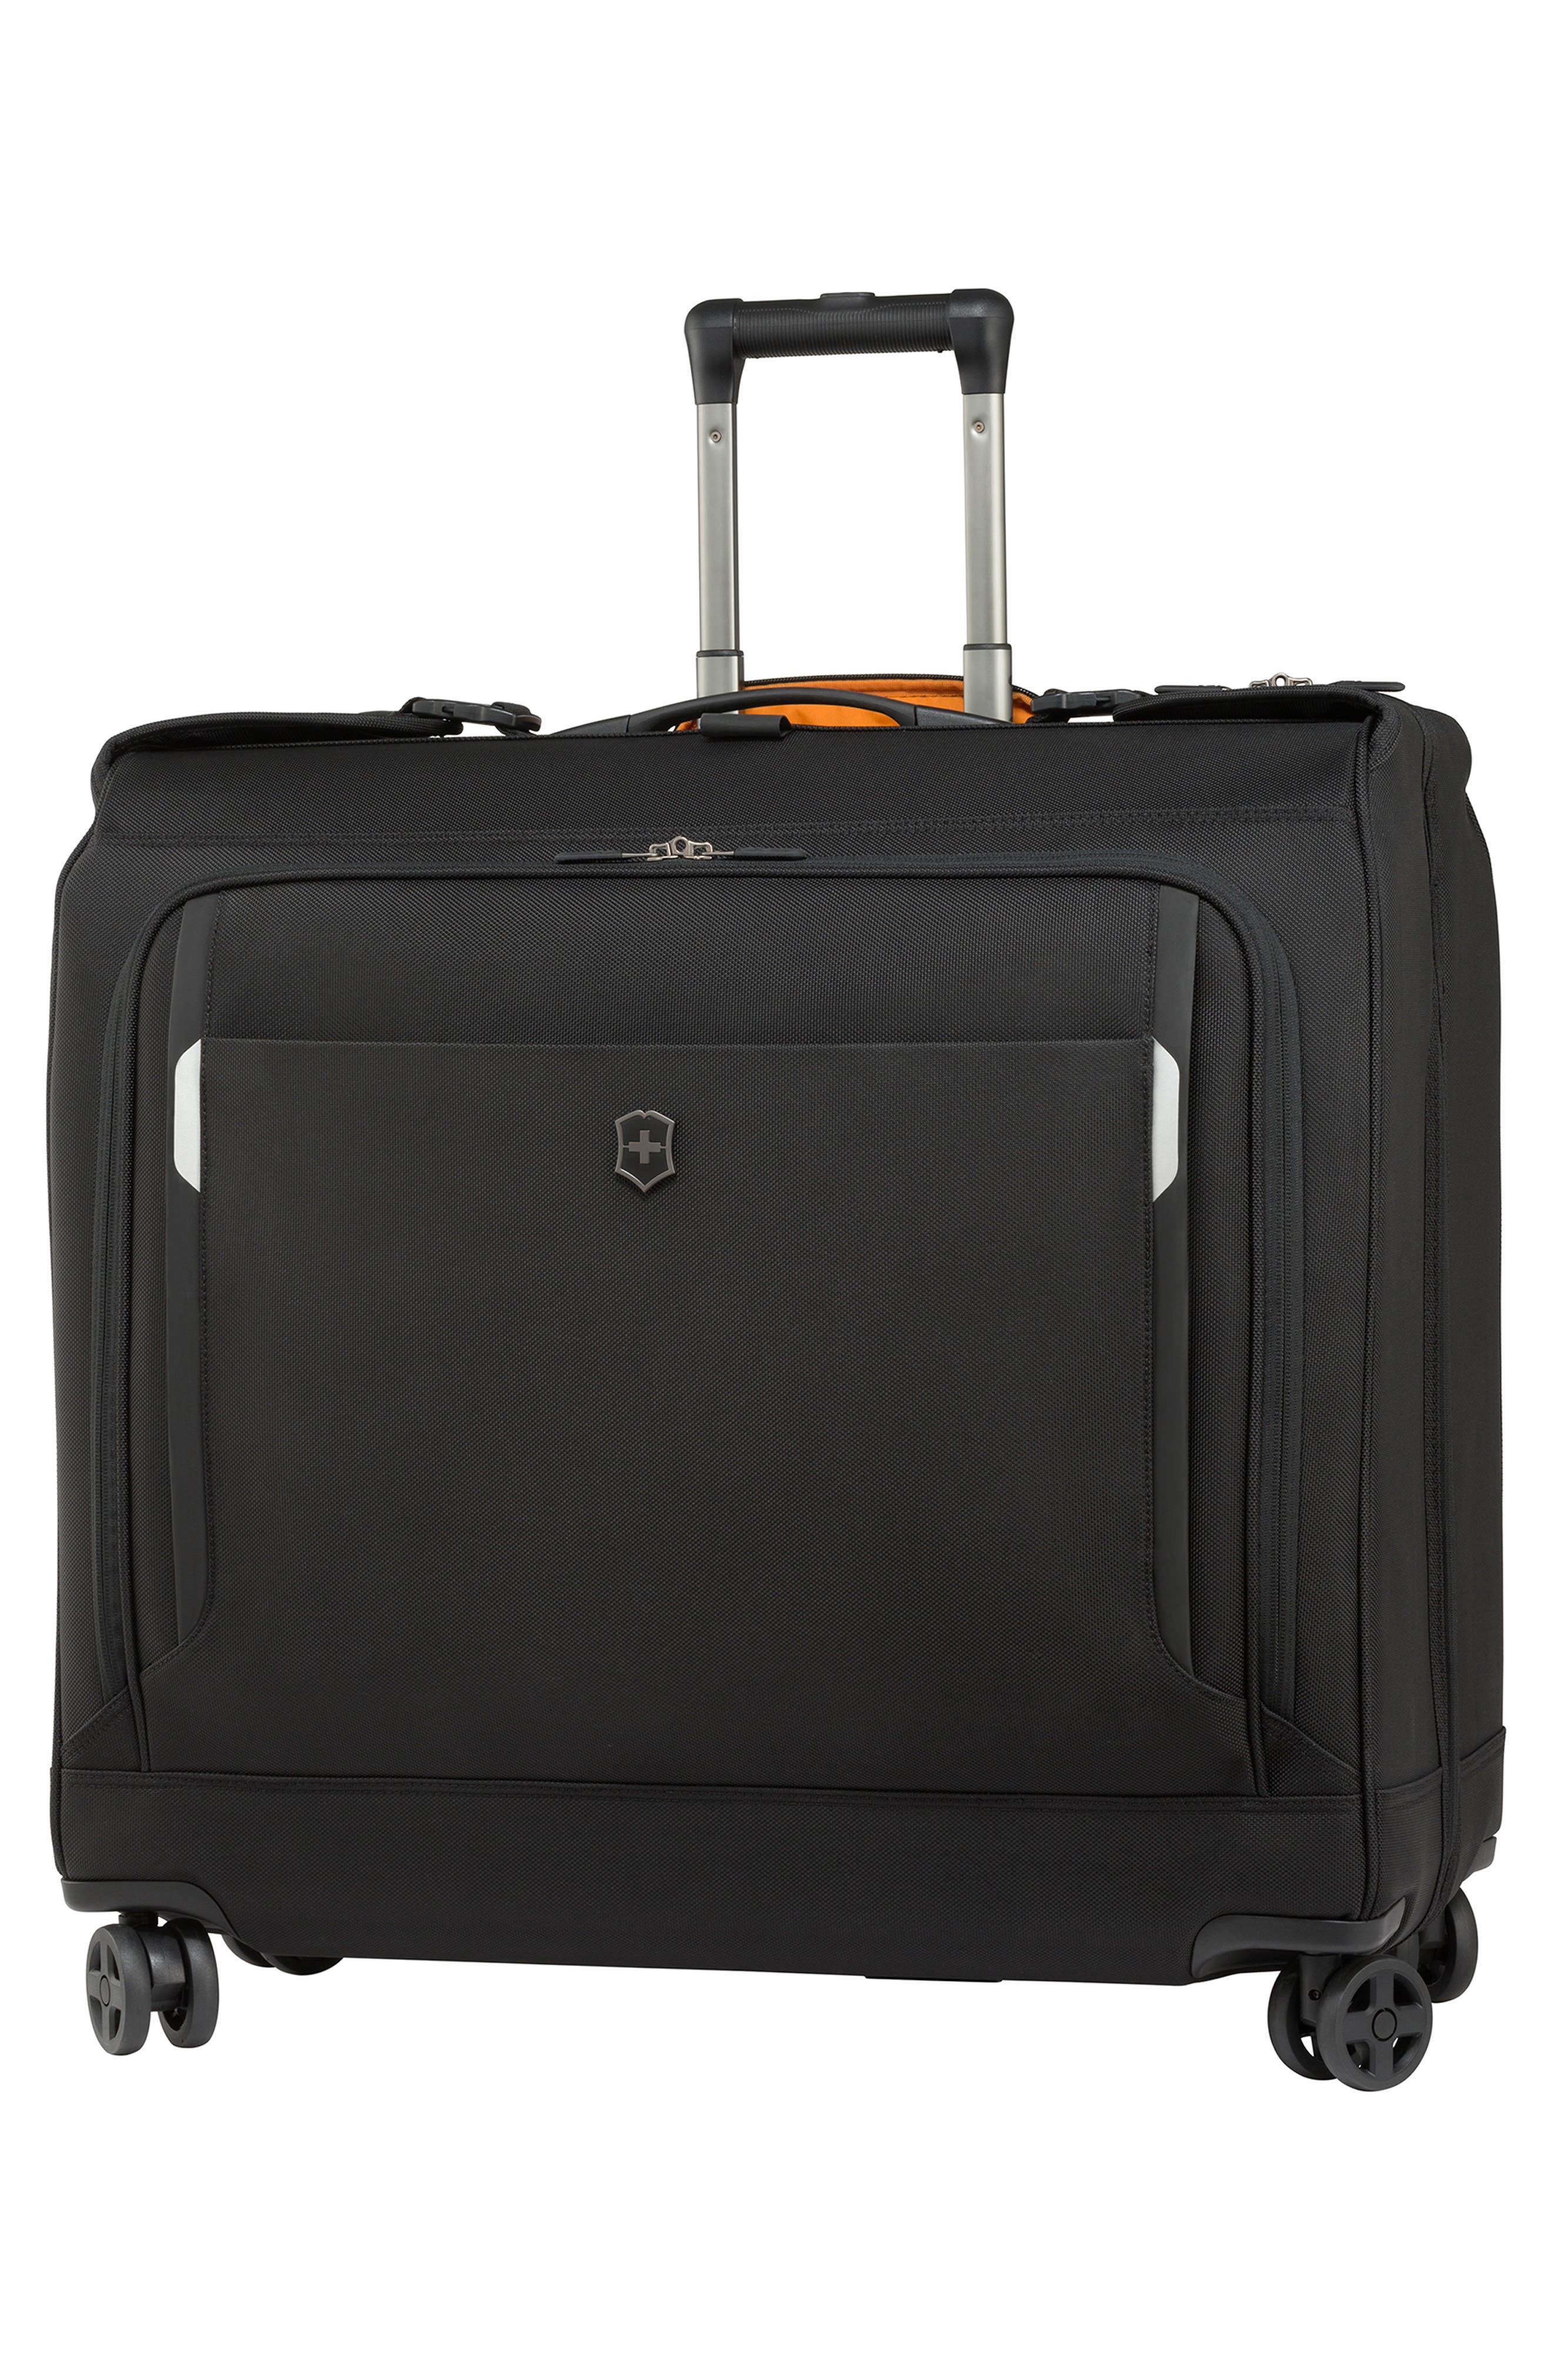 WT 5.0 Dual Caster Wheeled Garment Bag,                             Main thumbnail 1, color,                             001